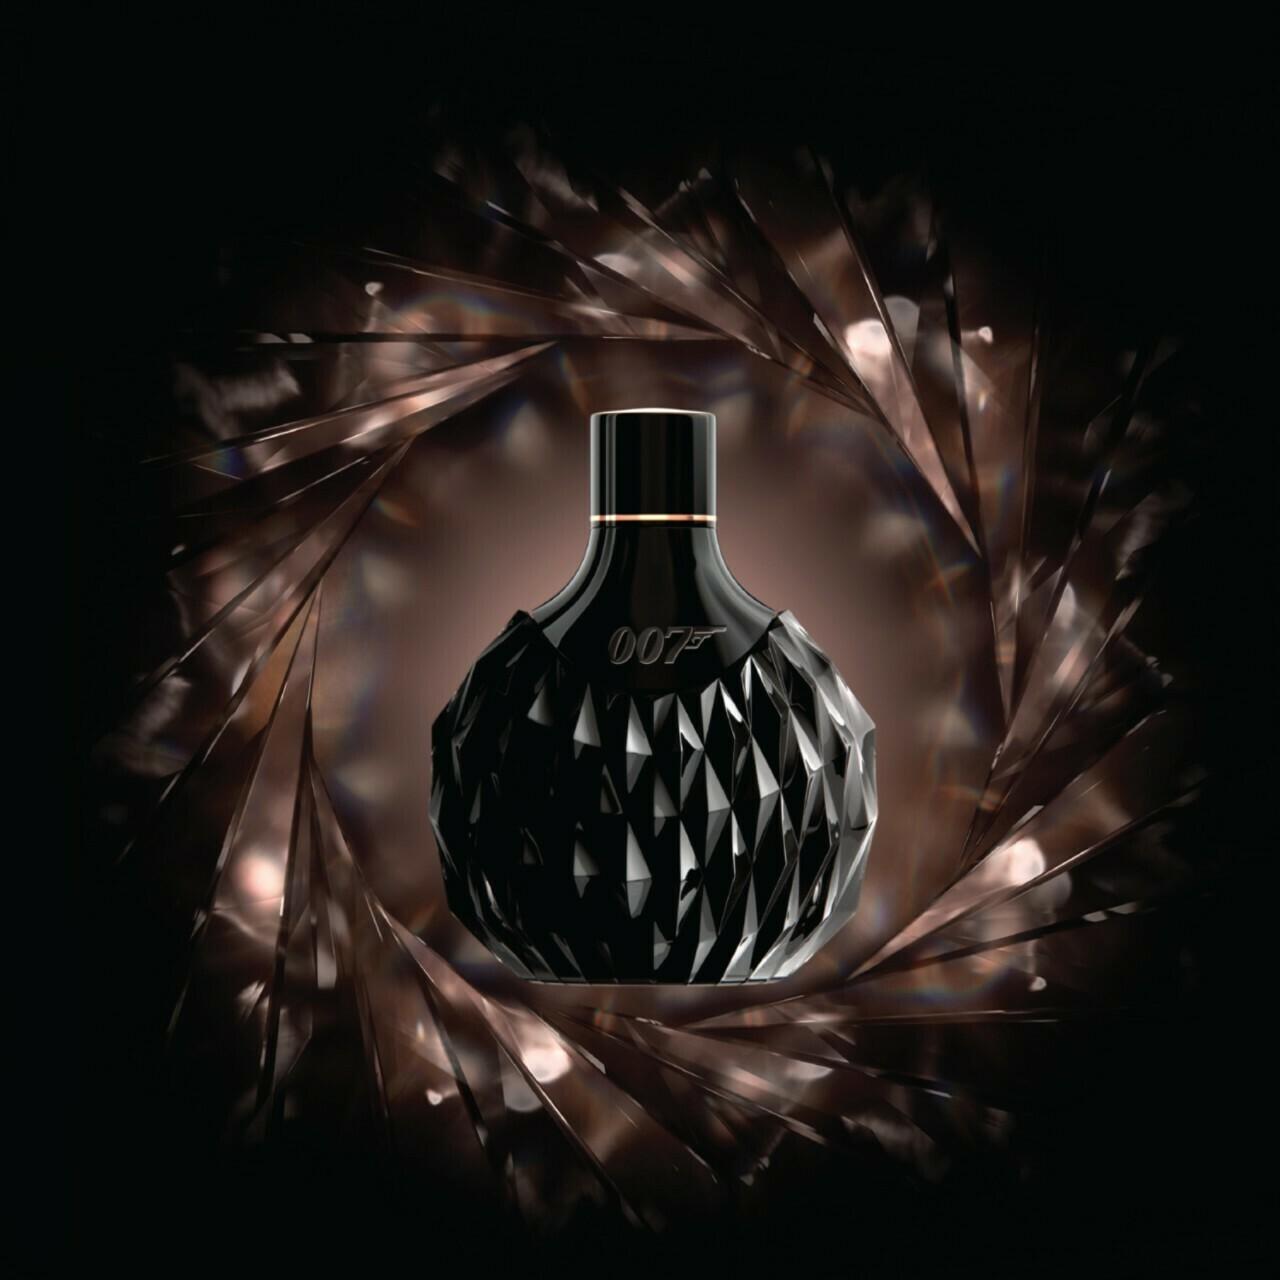 James Bond 007 for Women I Eau de Parfum 50ml